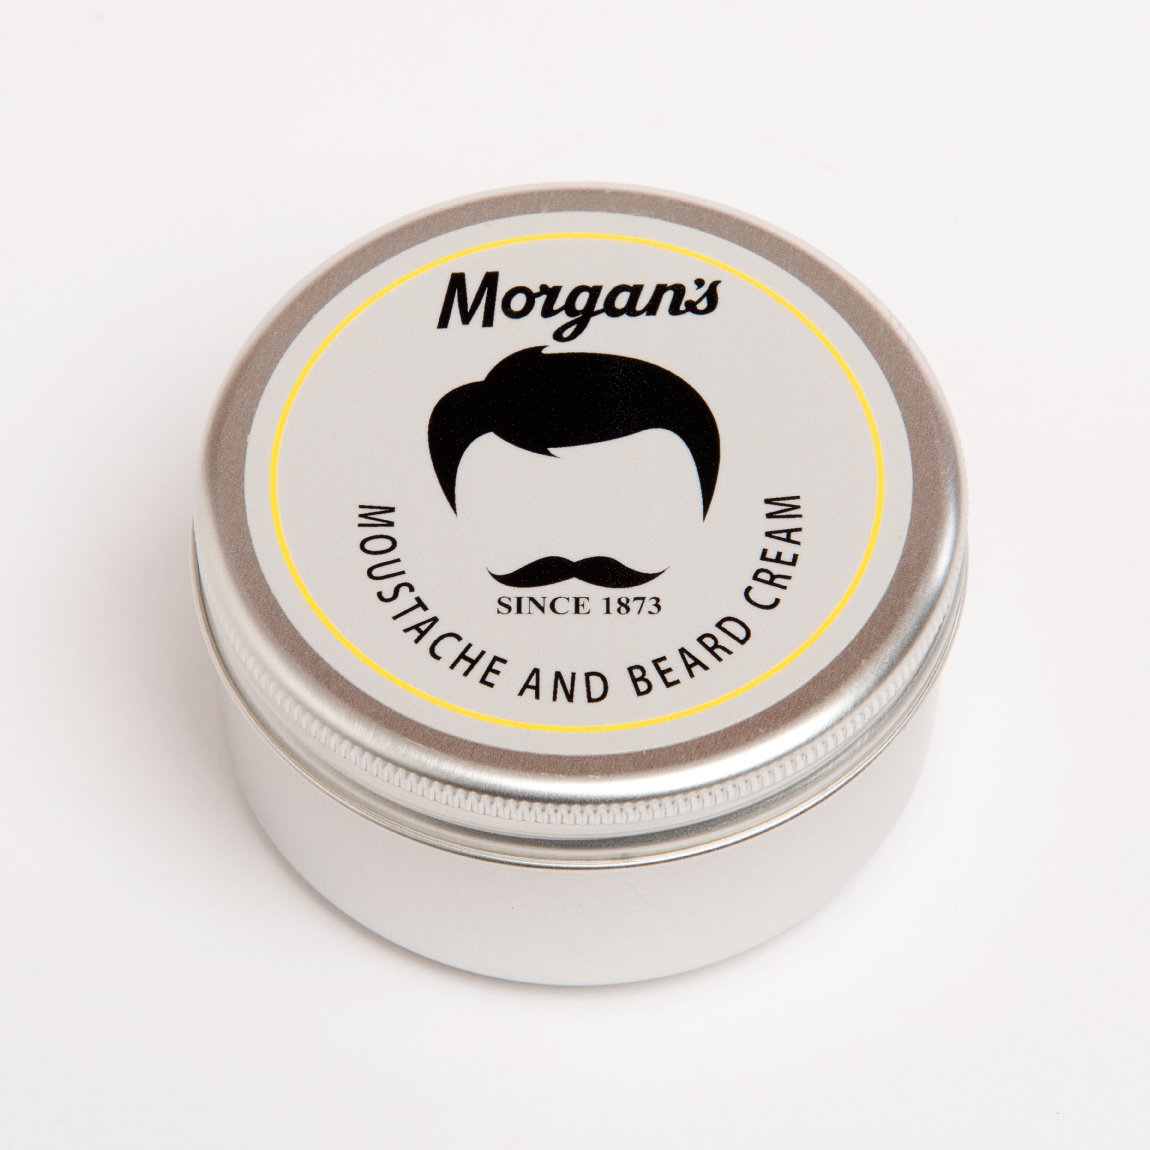 MORGAN'S Moustache and beard cream / Крем для усов и бороды 75 мл